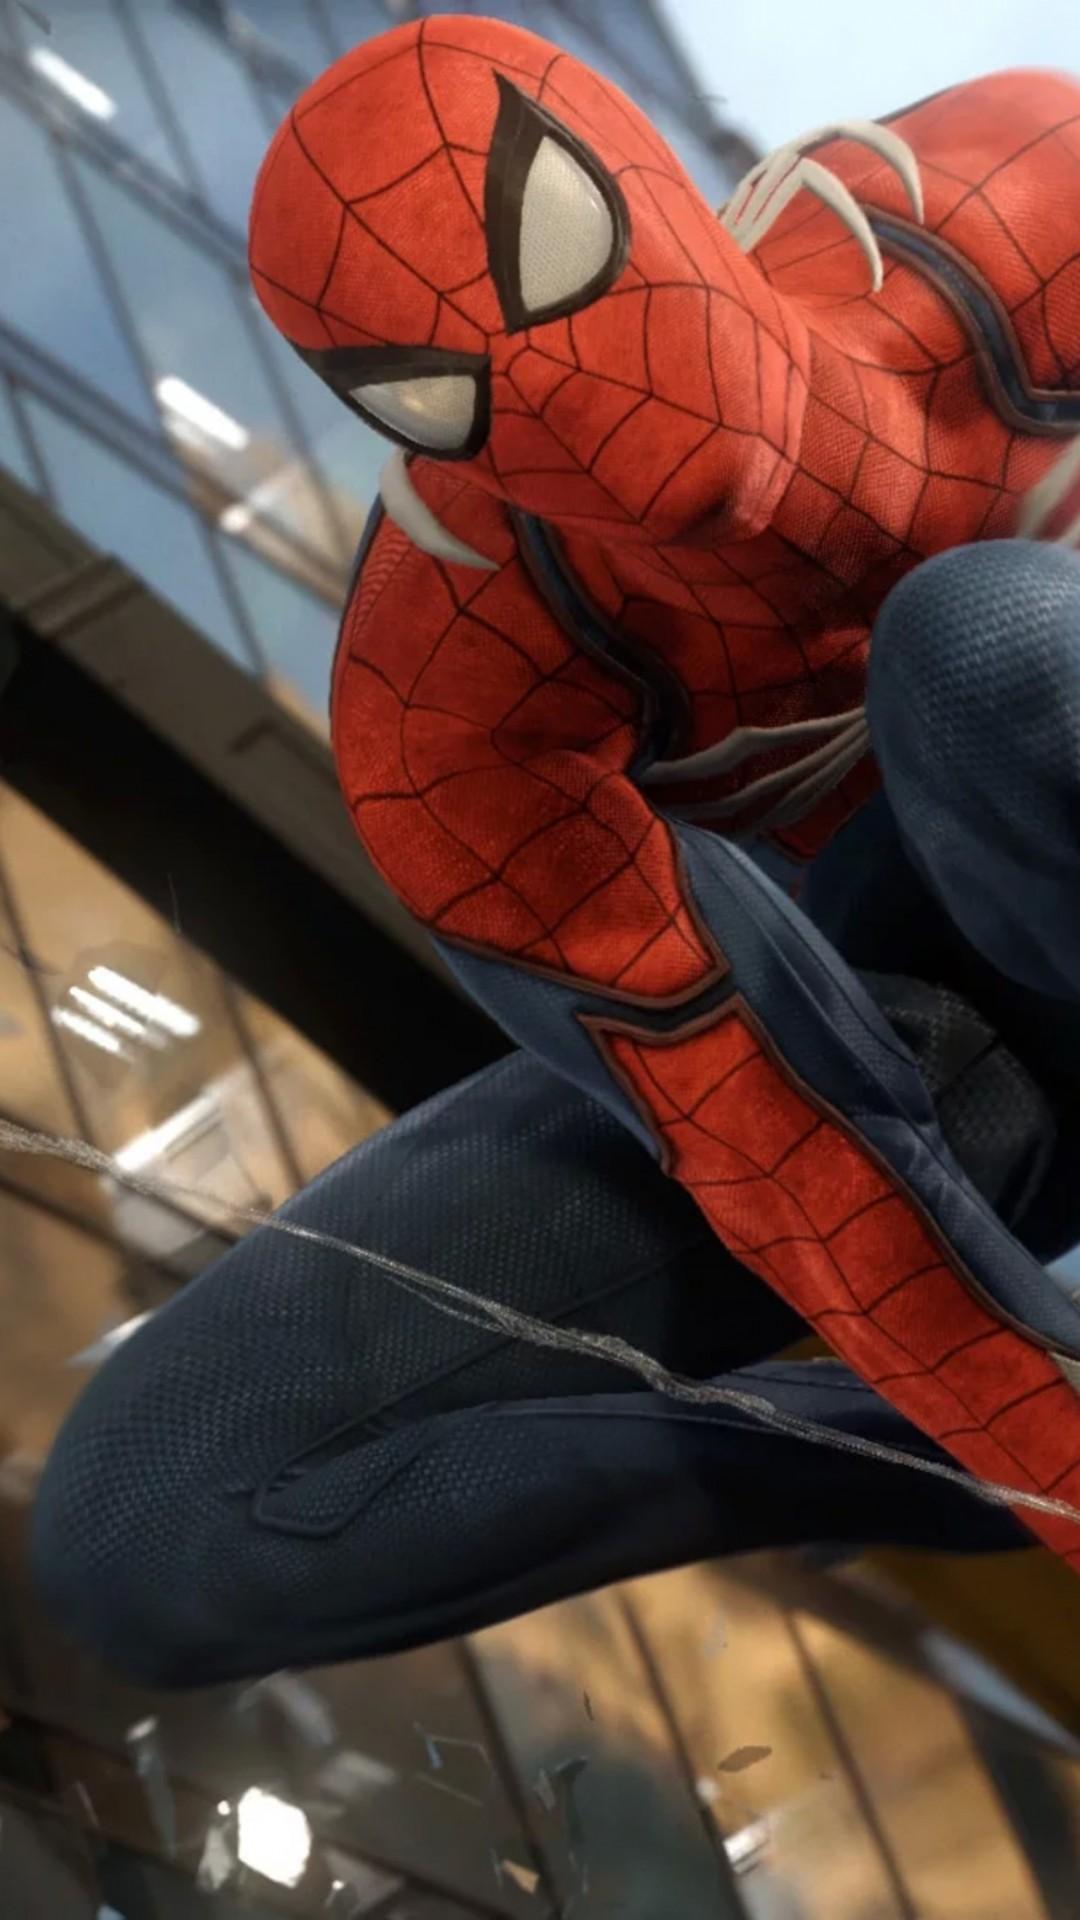 spiderman_Wallpaper Spider-Man, Marvel, superhero, ps4, Games #12379